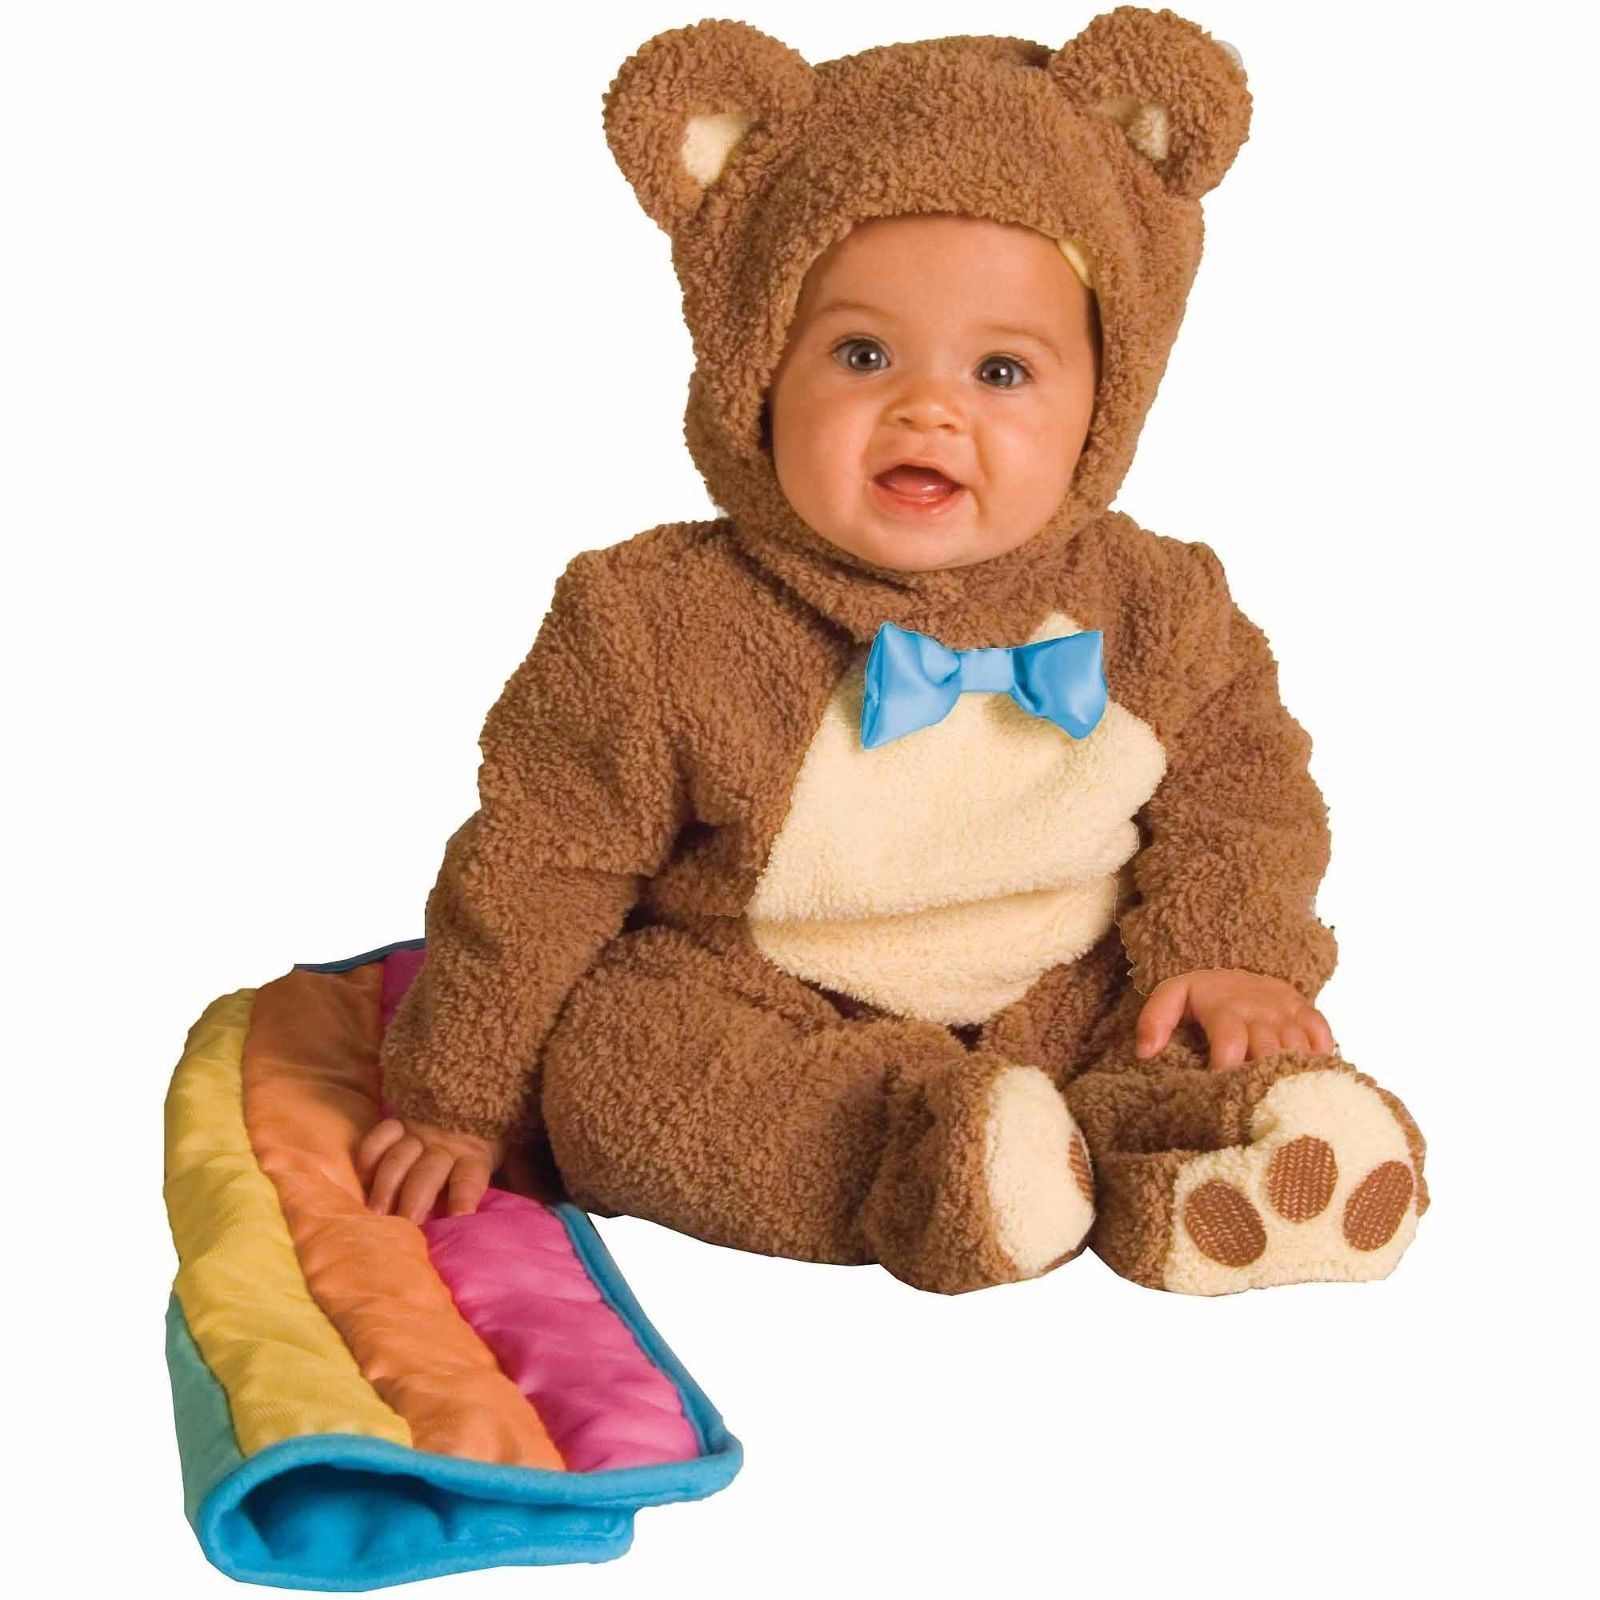 Teddy Bear Infant Toddler Halloween Costume 0-6 6-12 12-18 months sizes